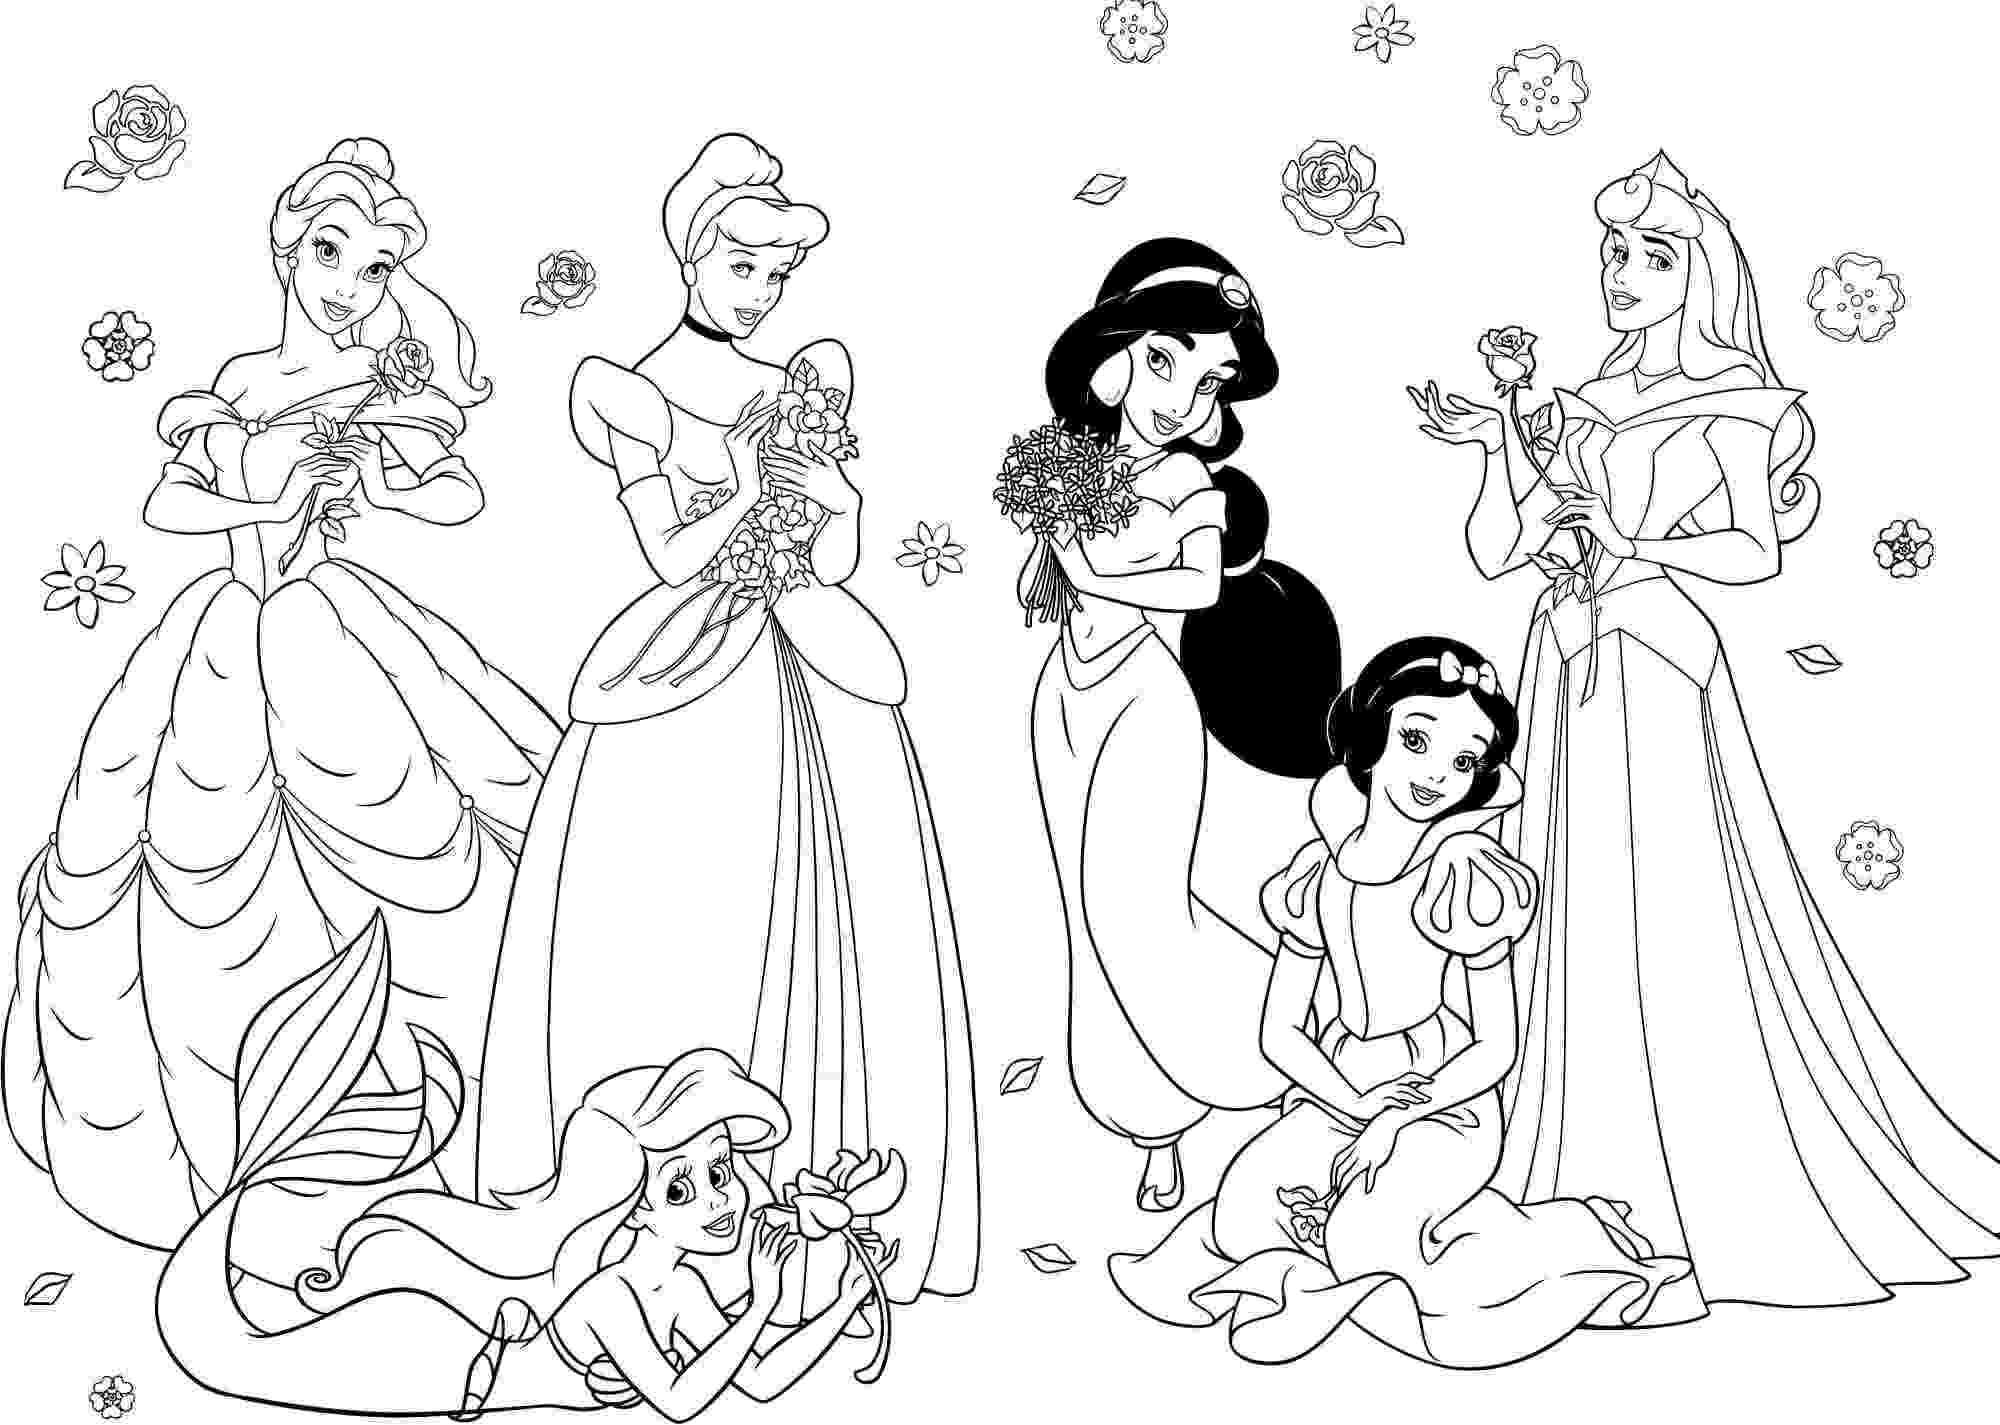 free disney princess coloring pages happy birthday disney coloring pages coloring home princess disney coloring pages free